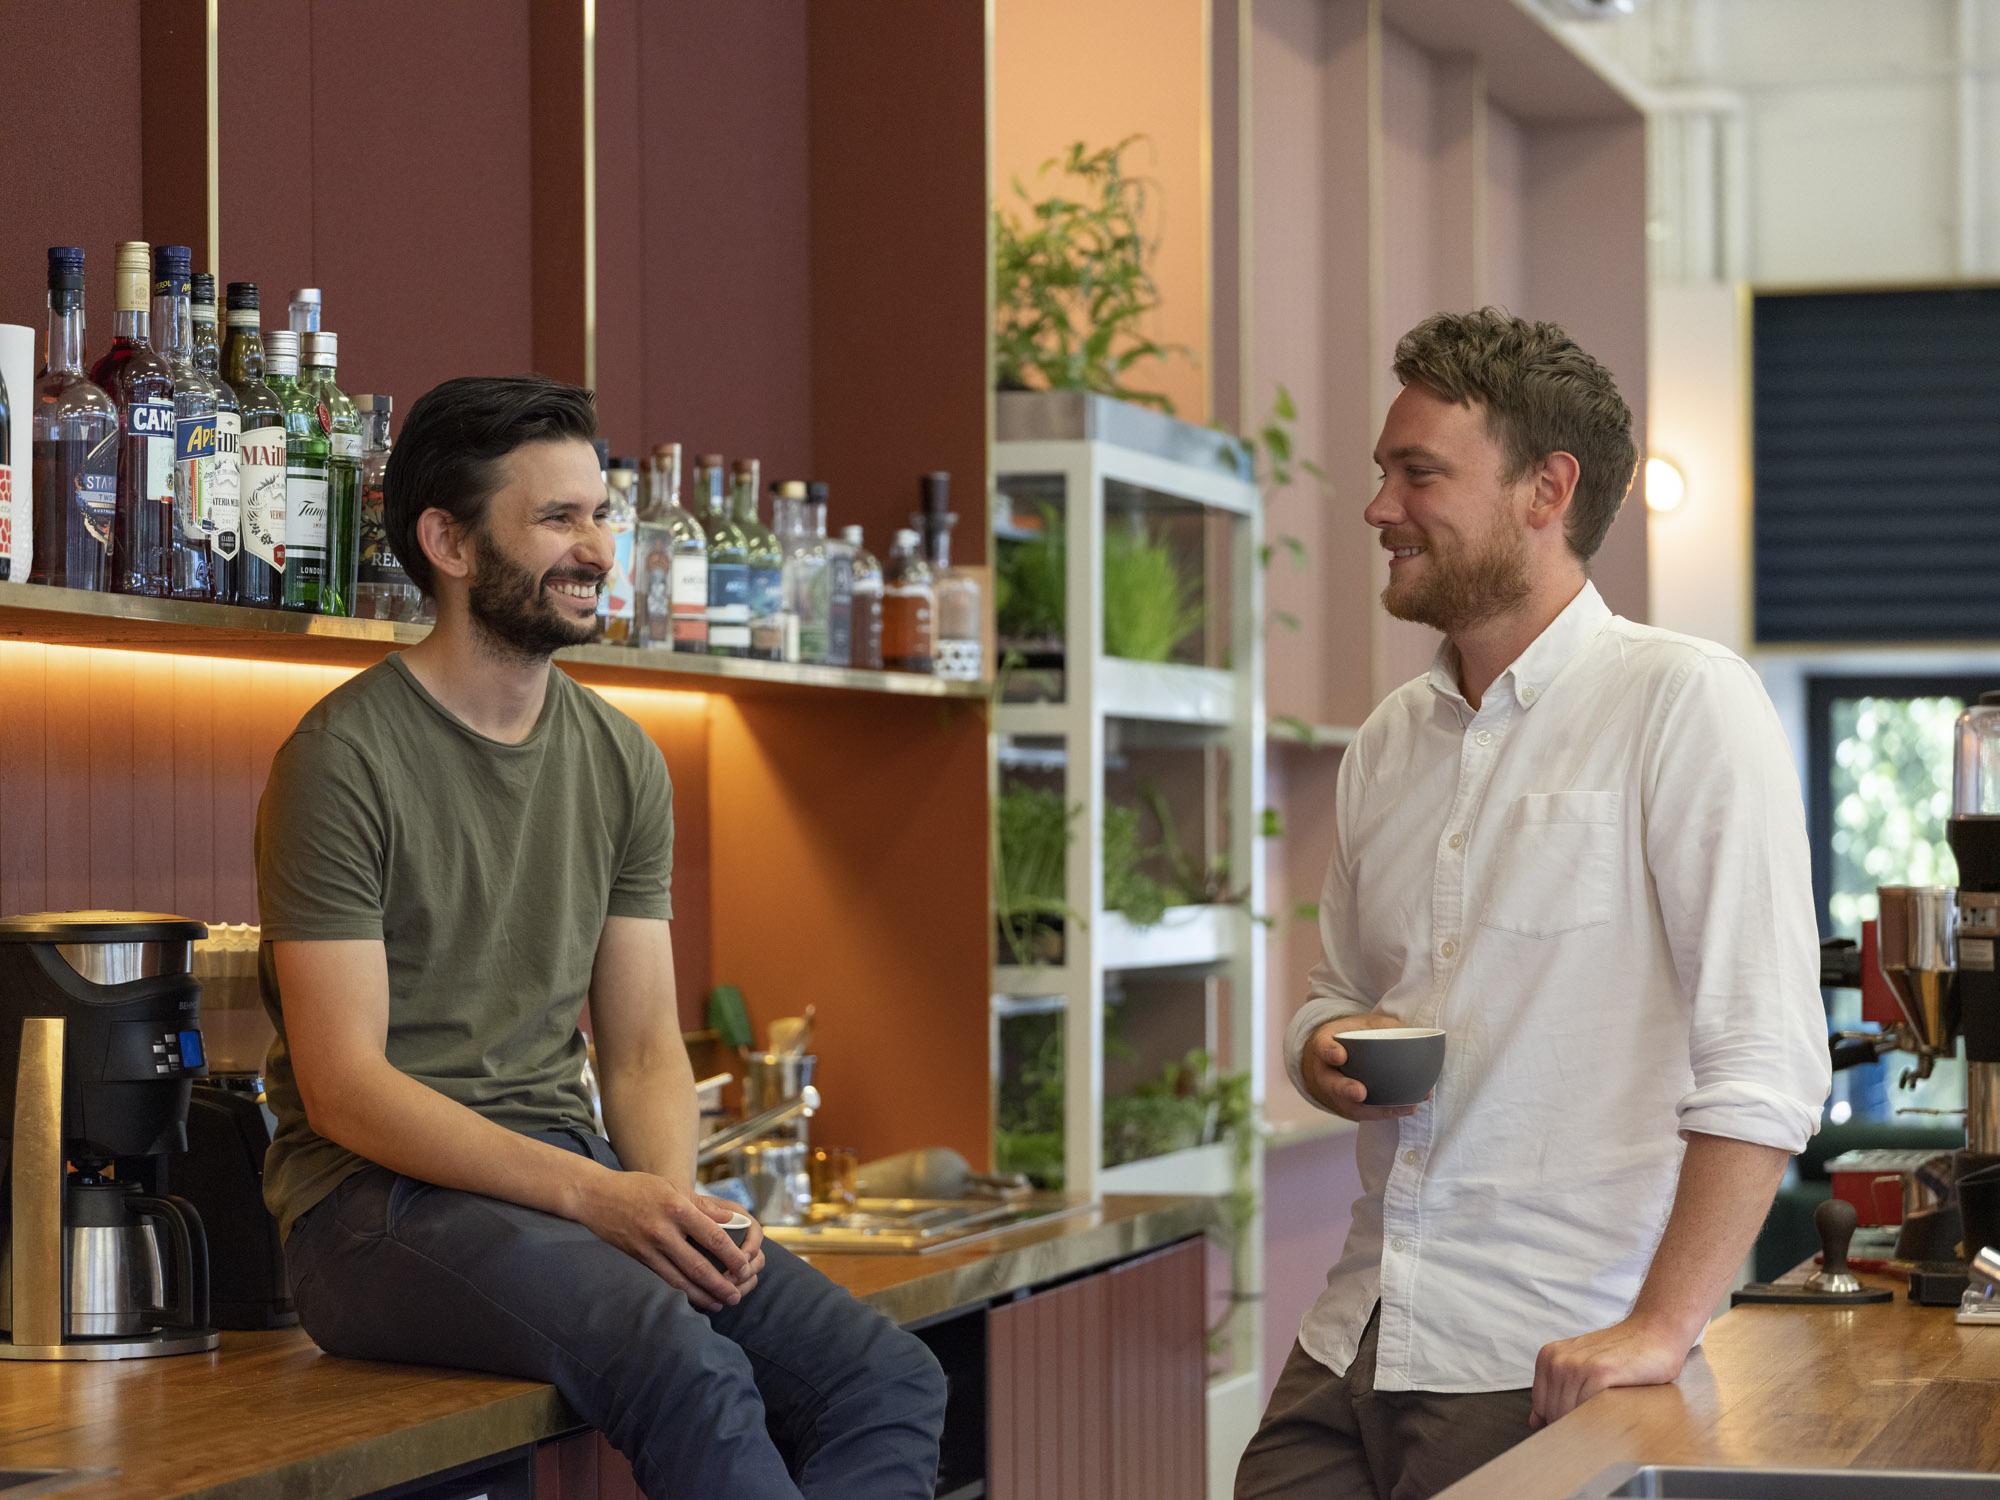 Michael Bascetta (left) and Roscoe Power at Worksmith / Photography: Josh Robenstone